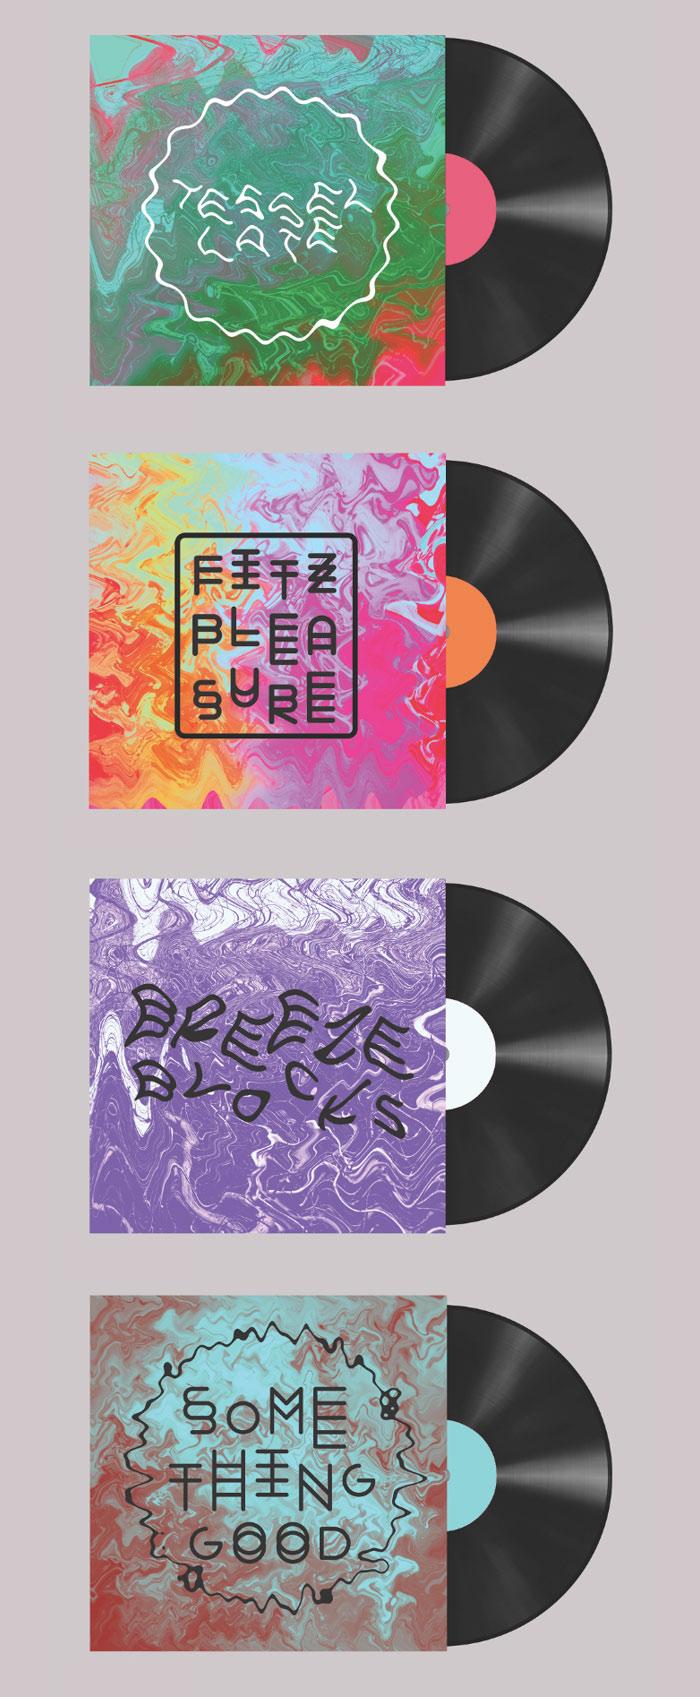 Eve Warren / Record sleeve design concepts - Alt-J